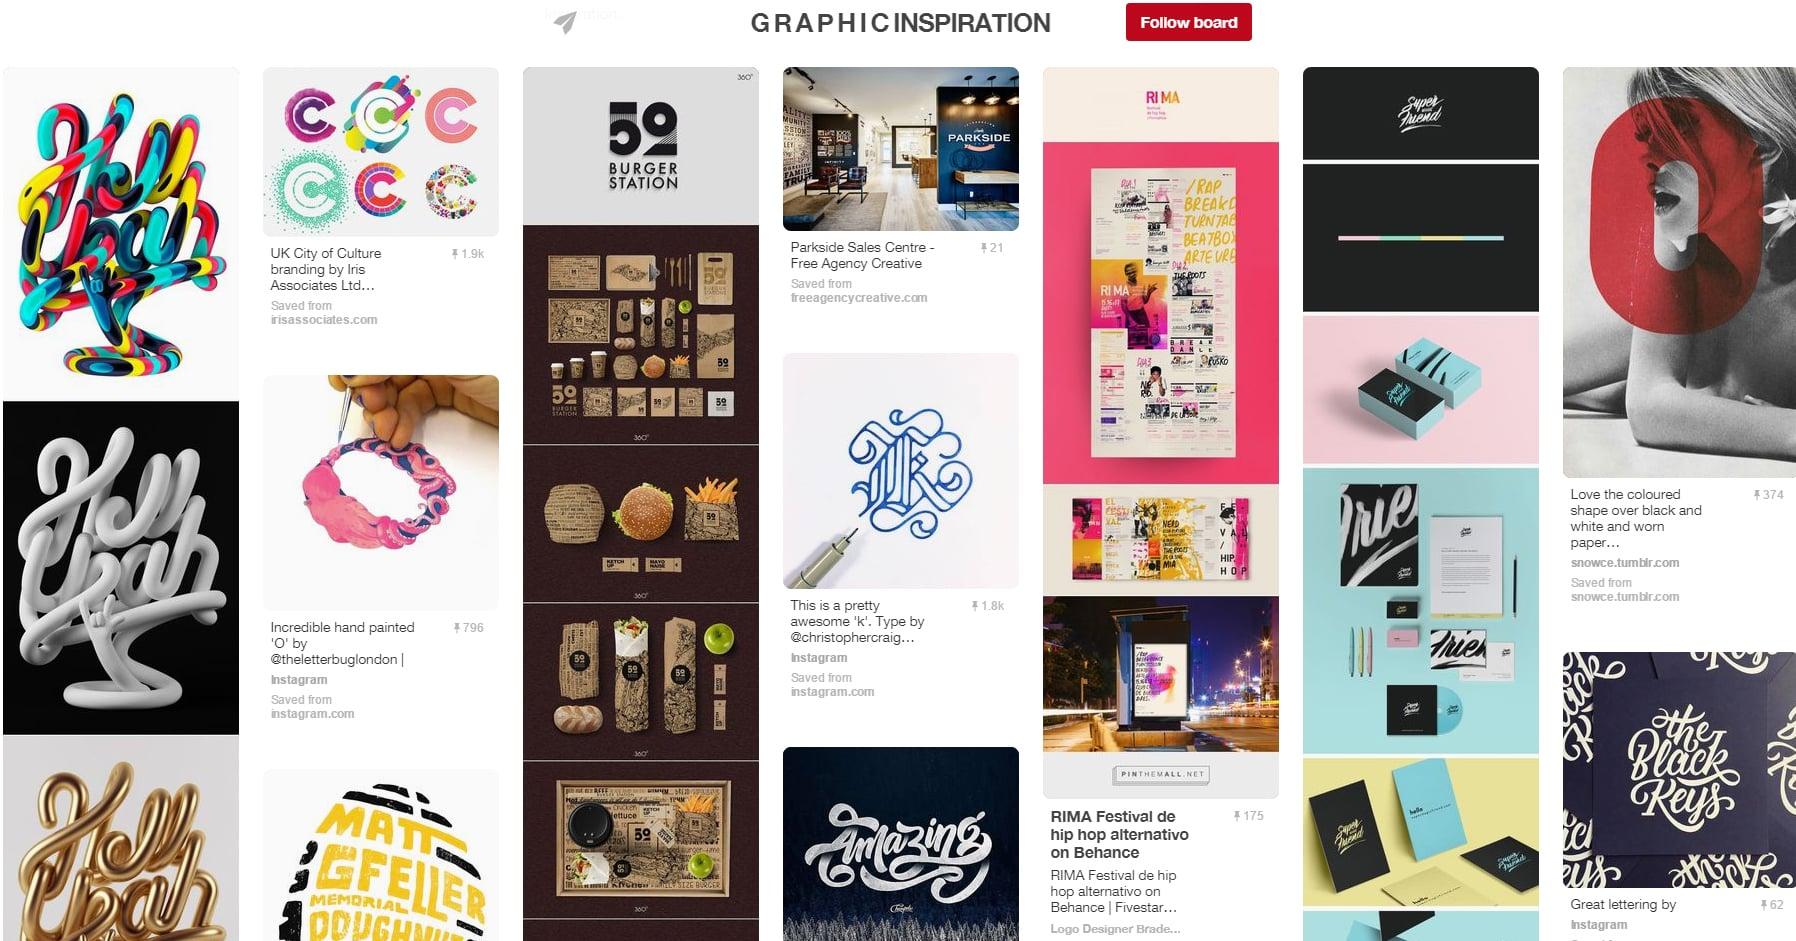 Top 10 Graphic Design Pinterest Boards All Designer Should Follow